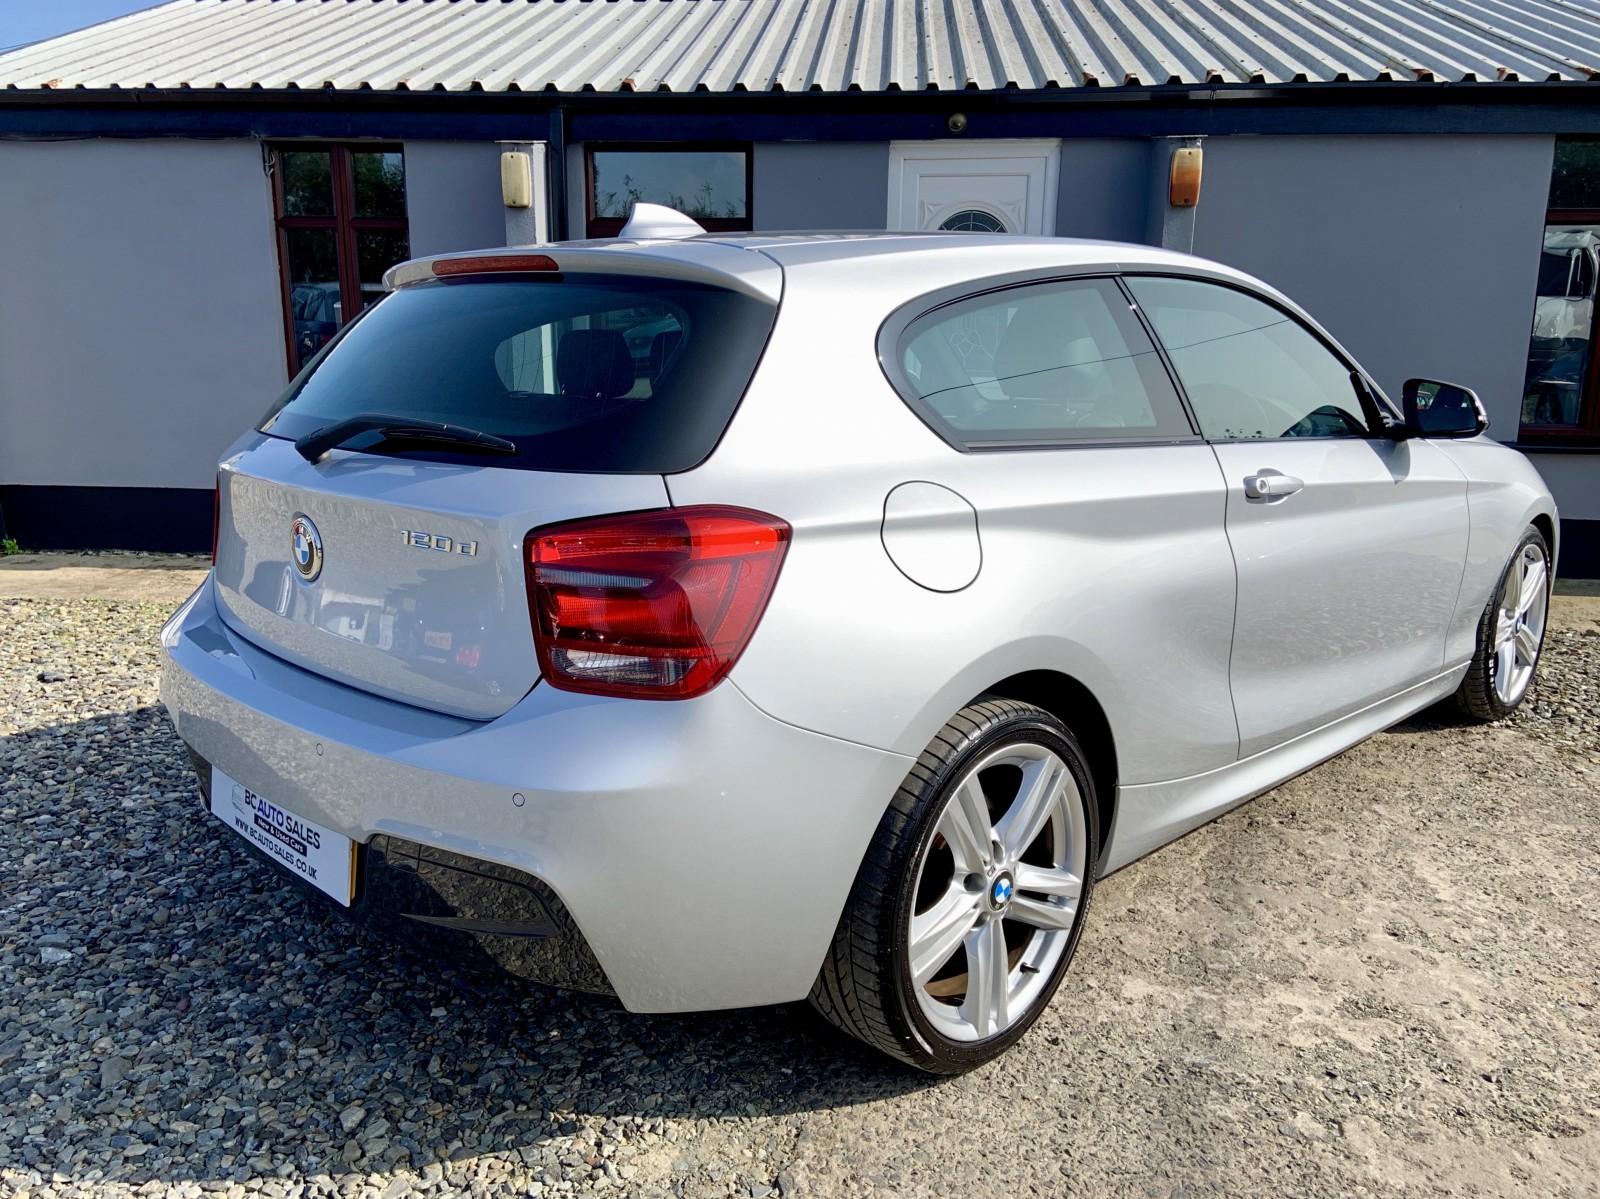 2013 BMW 1 Series 120D M SPORT Diesel Manual – BC Autosales 17A Airfield Road, Eglinton, Londonderry BT47 3PZ, UK full